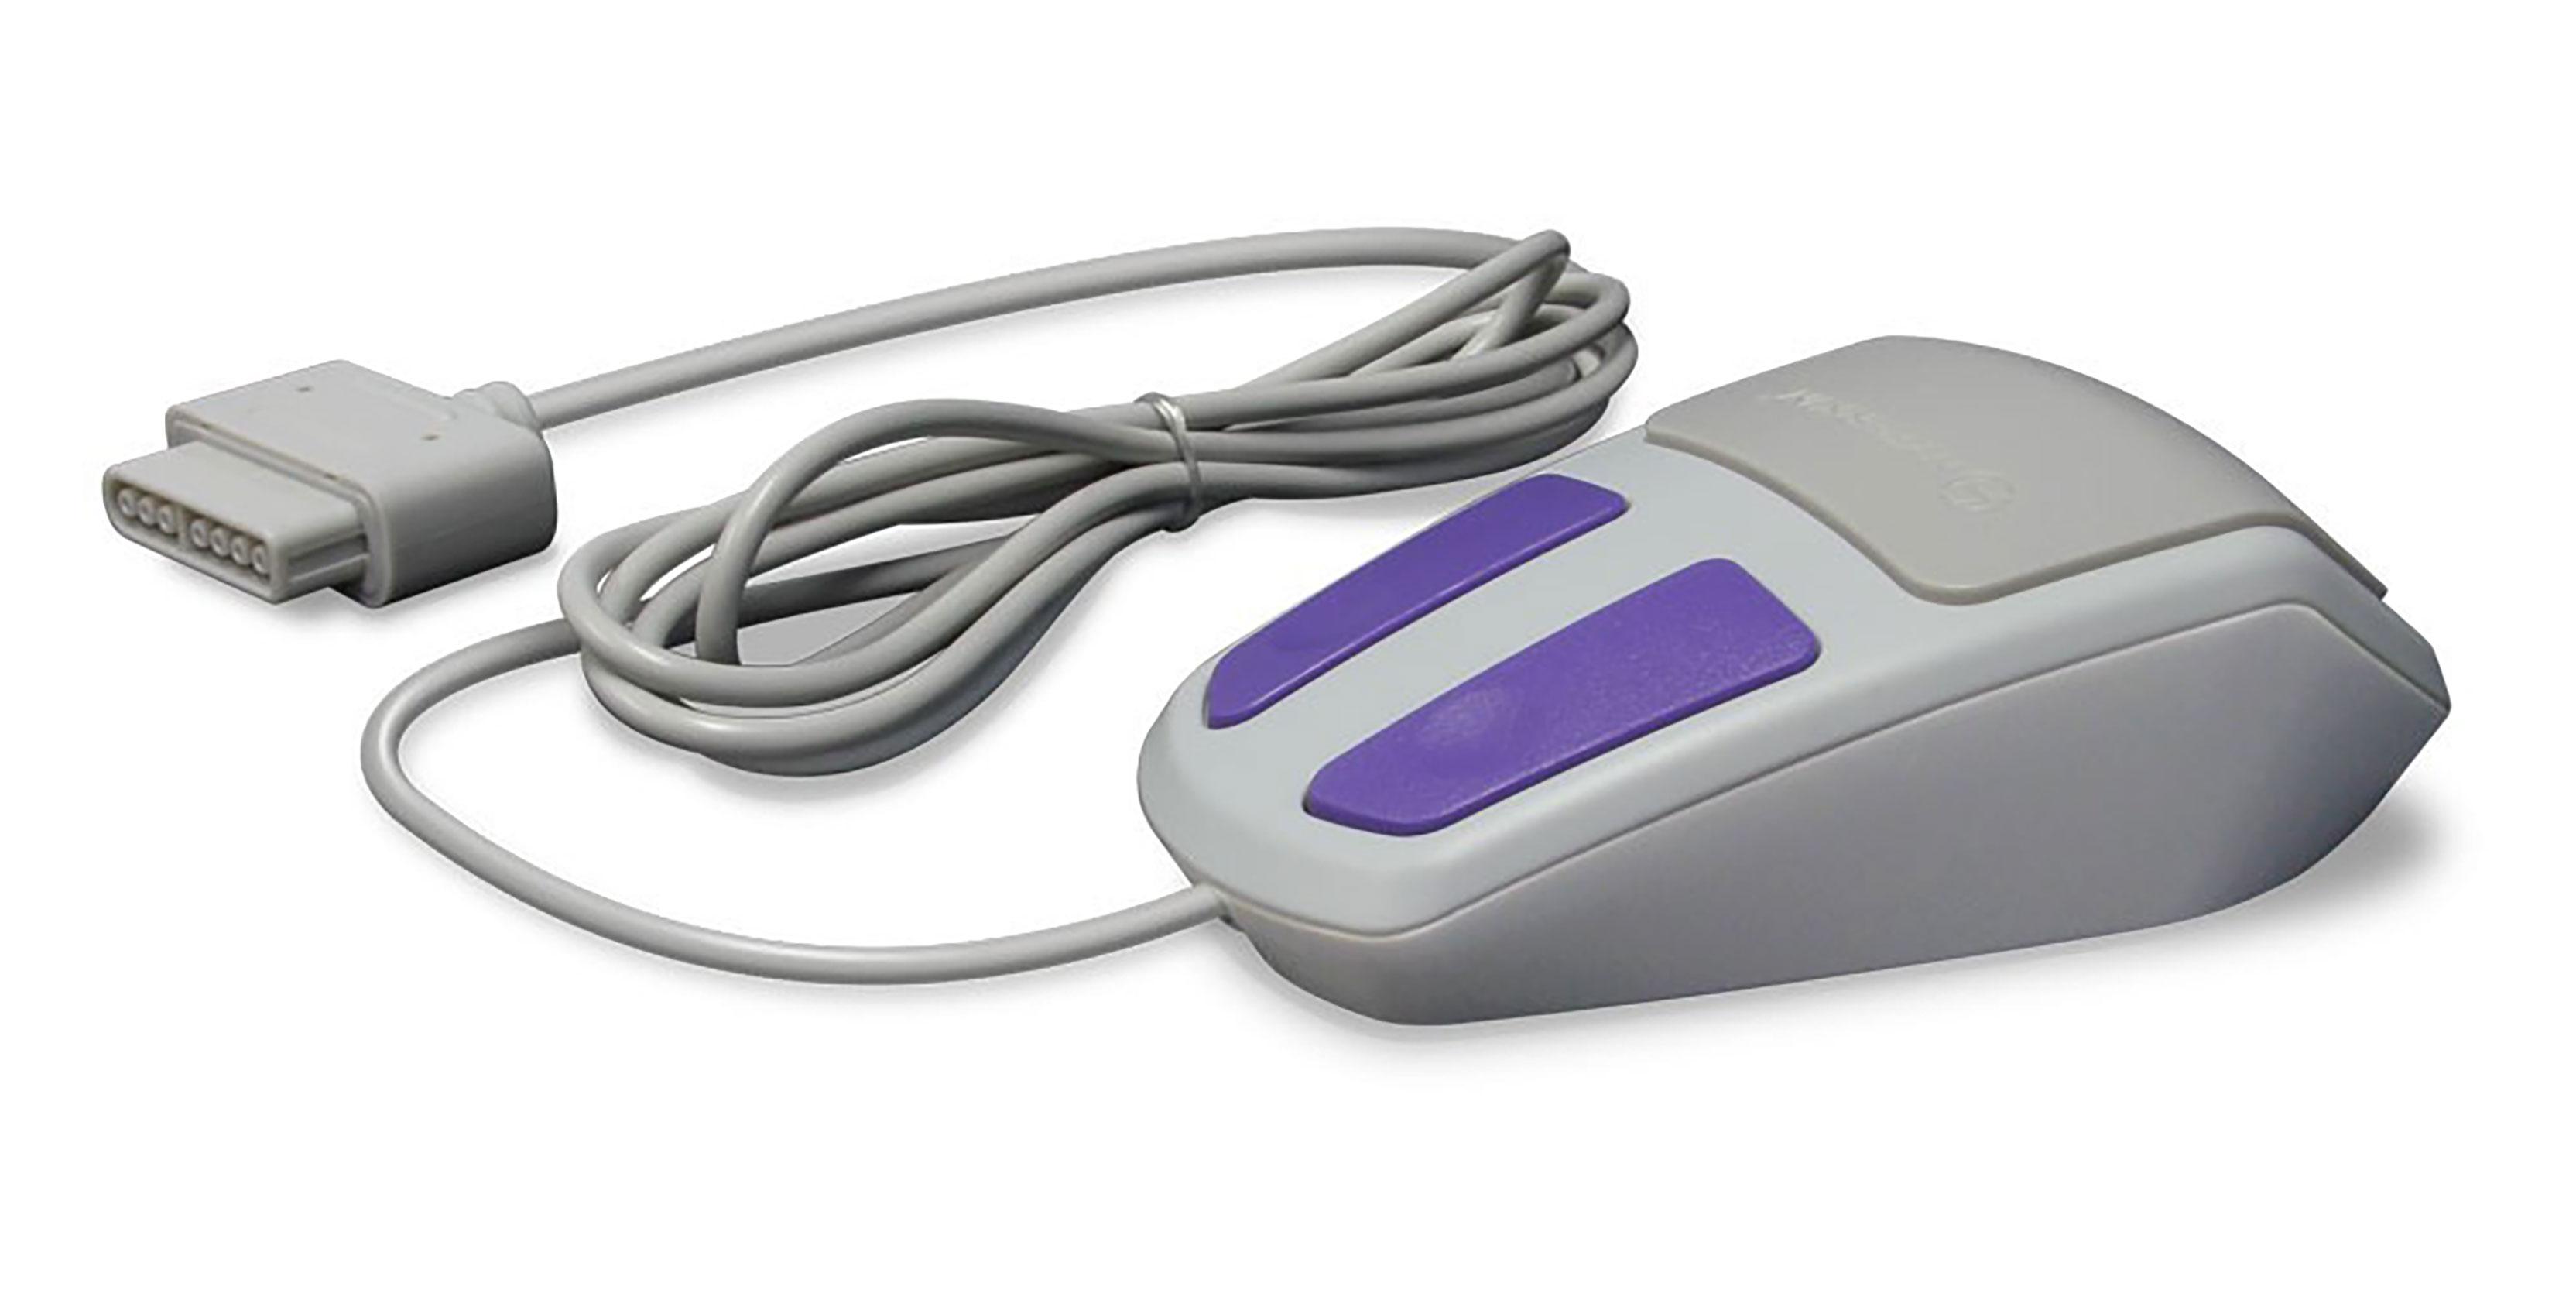 Hyperkin SNES mouse